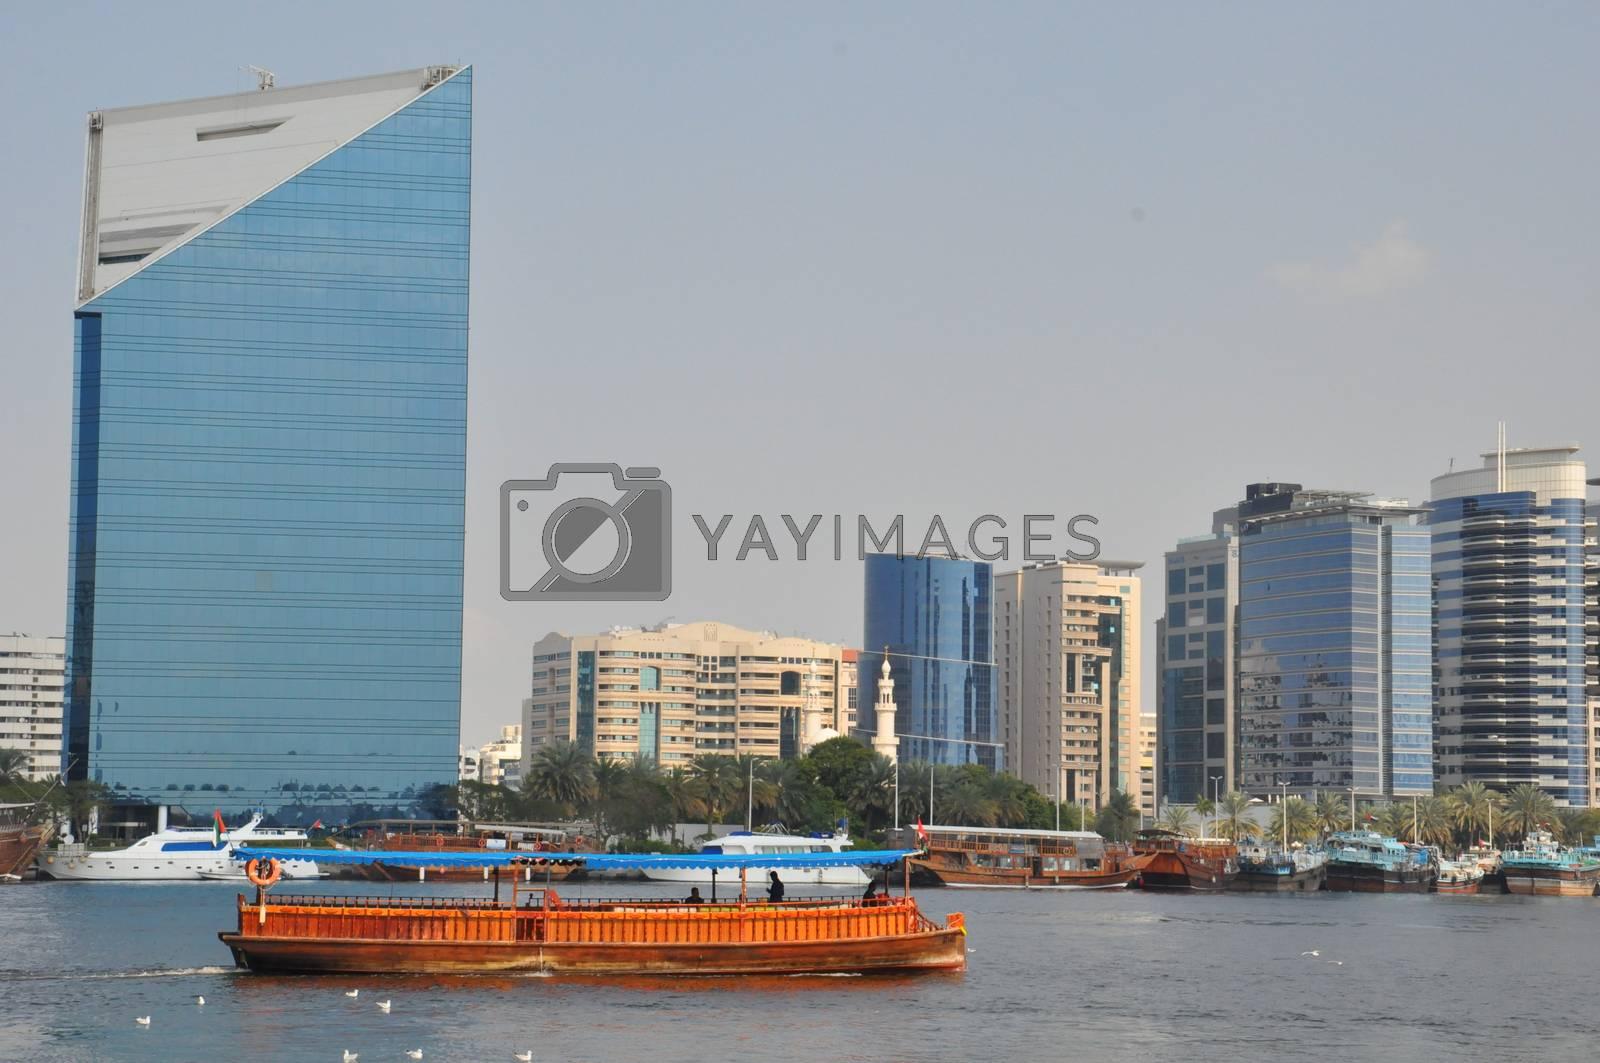 Dubai Creek in Dubai, UAE. The notable buildings along the Deira Creek are Deira Twin Towers, Dubai Creek Tower, National Bank, and Chamber of Commerce.